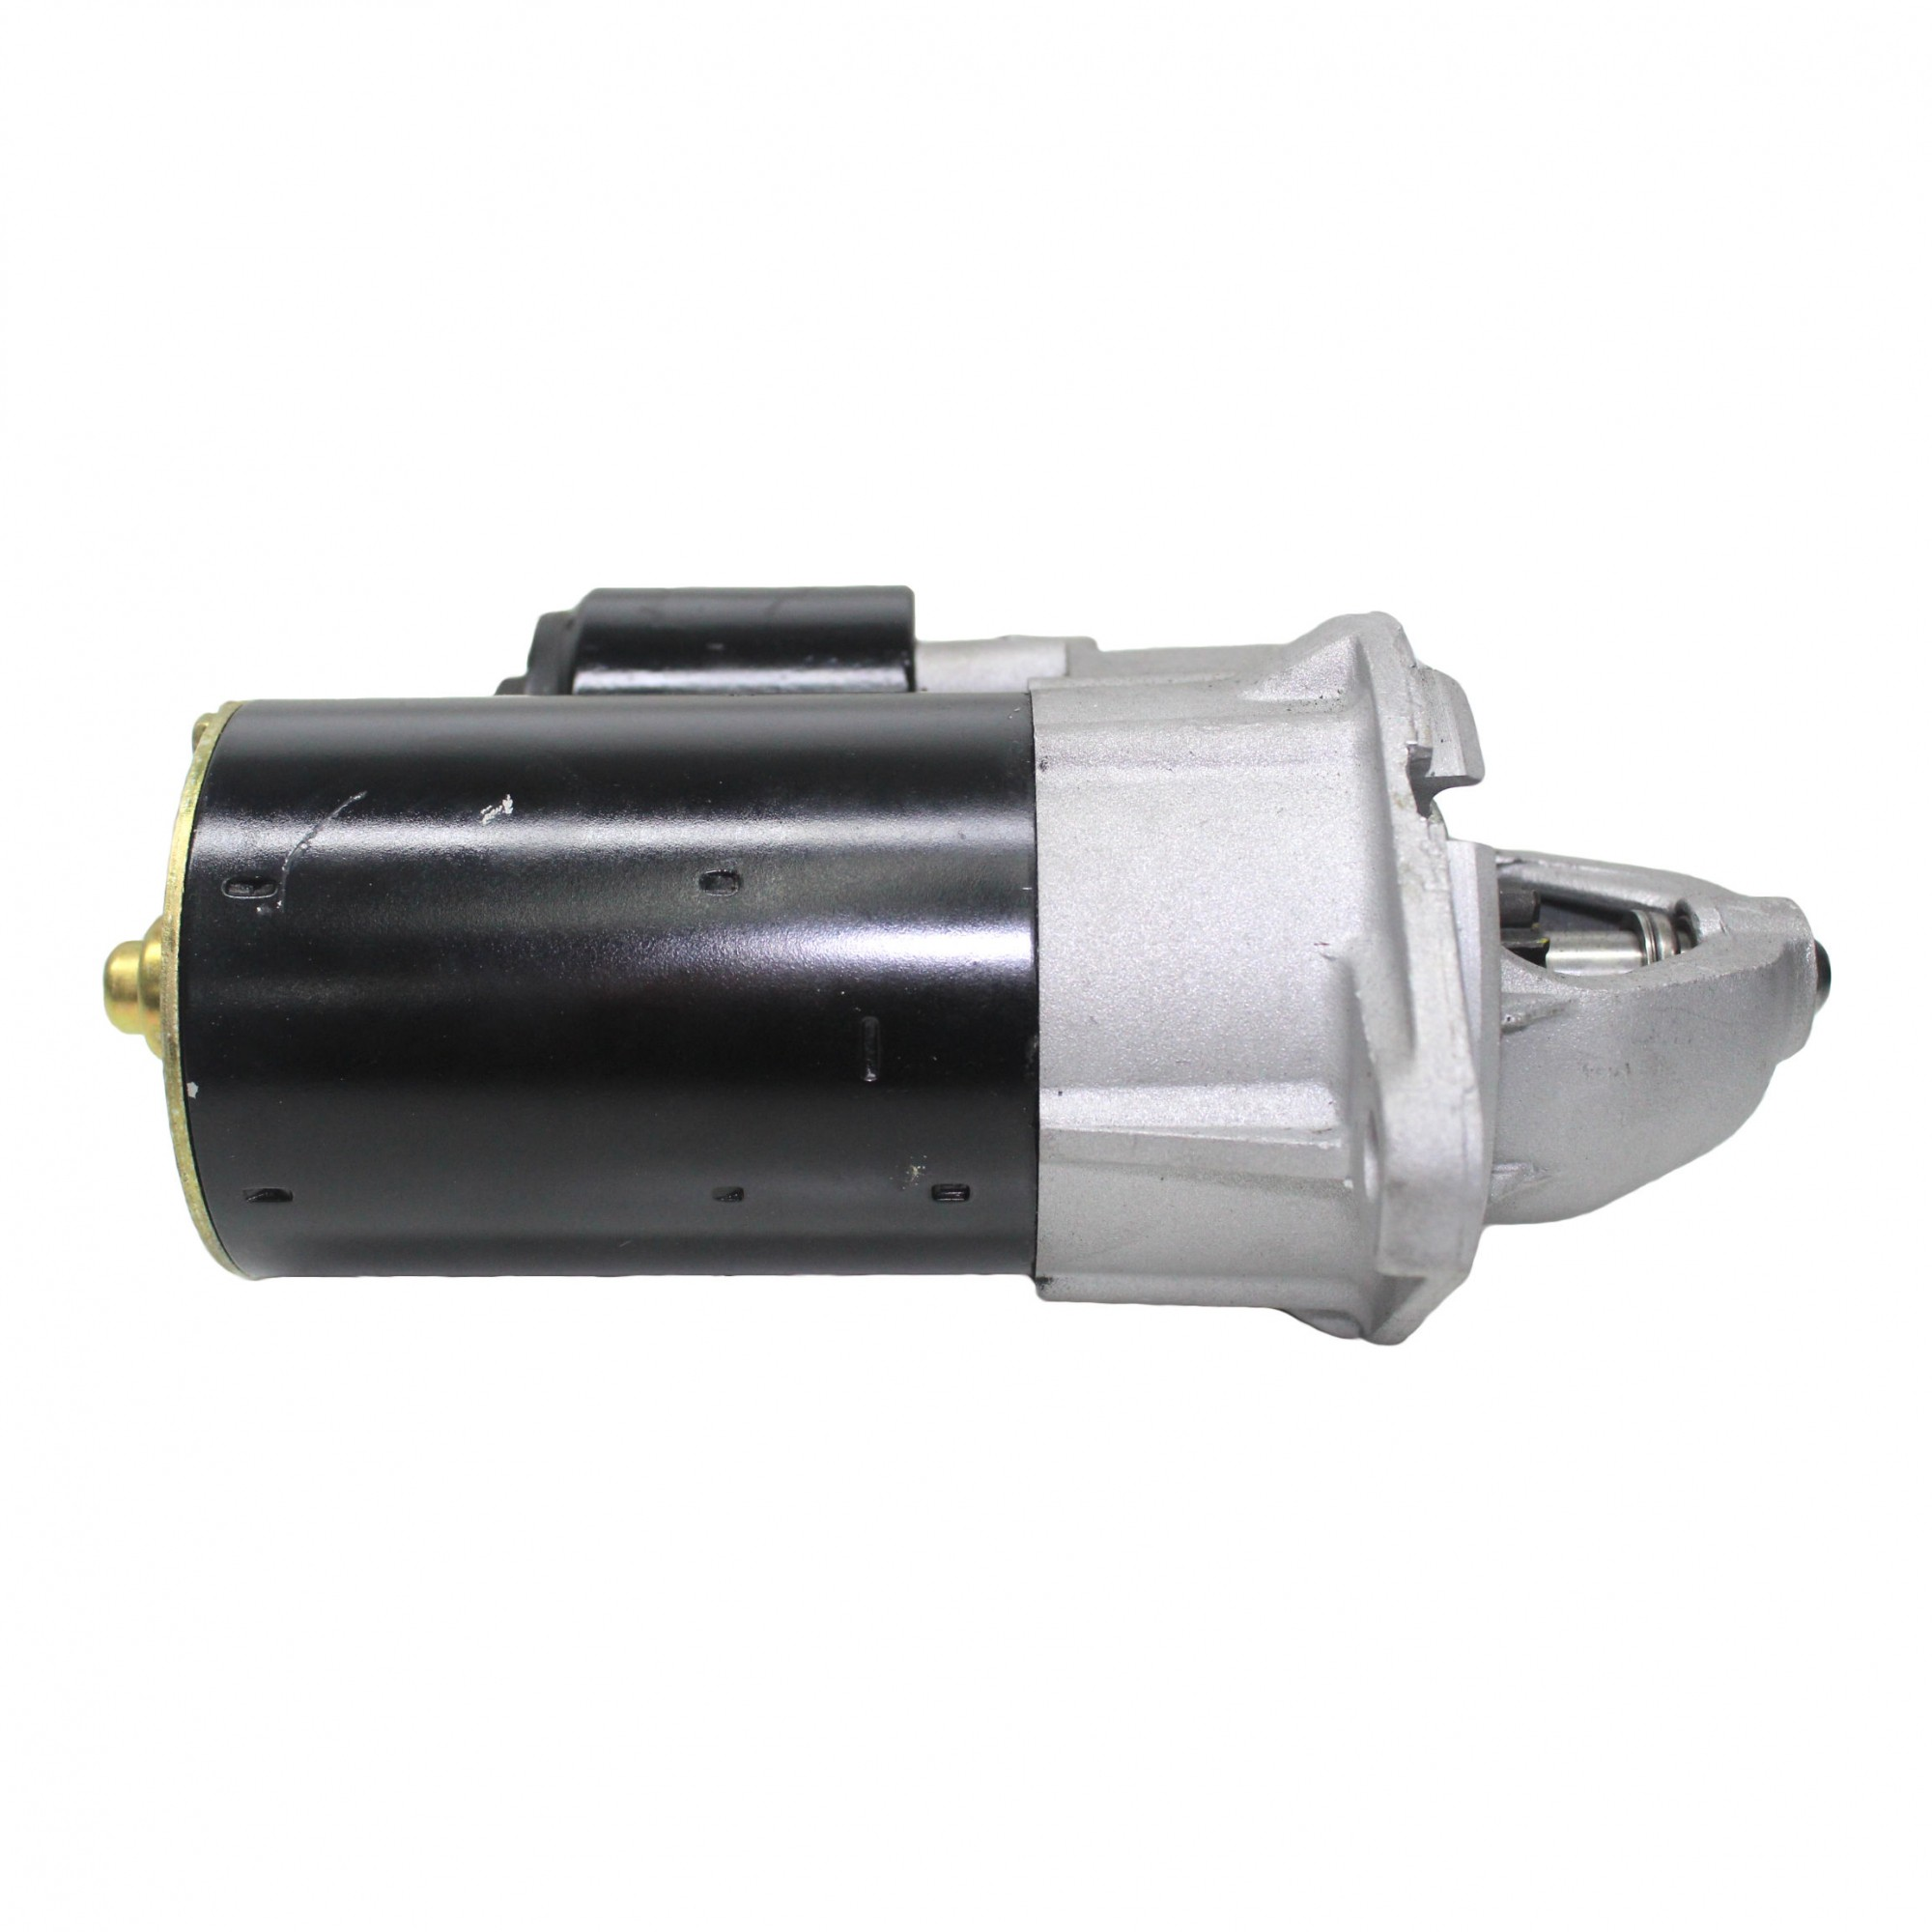 Motor de Arranque Partida Bosch Astra, Zafira, Vectra - motor 16v